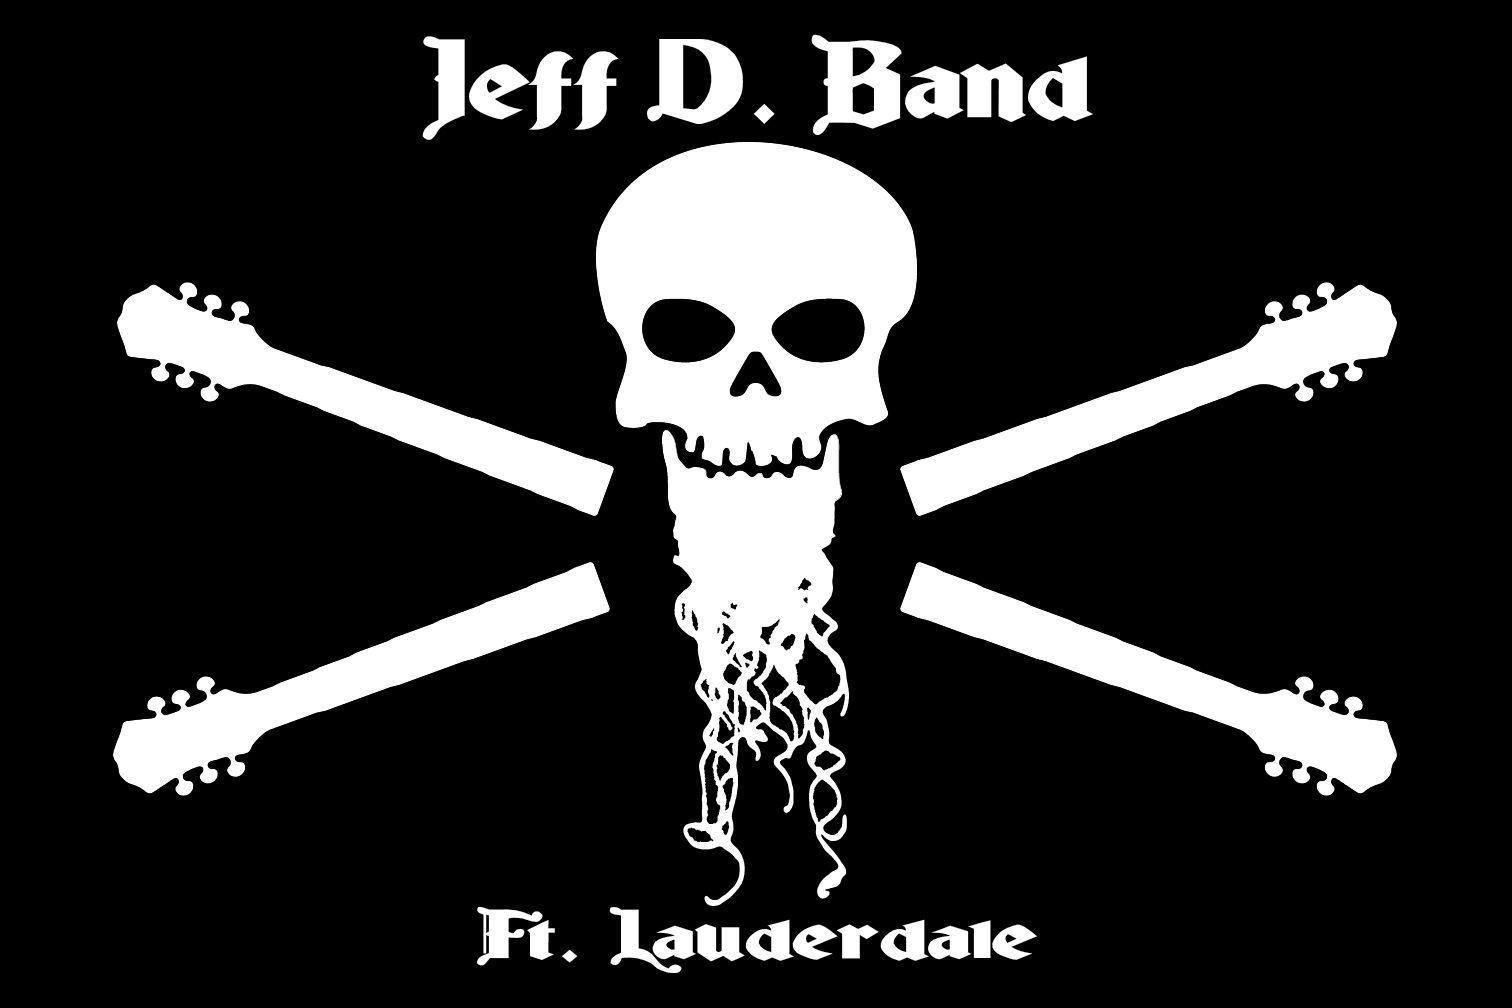 Jeff D Band